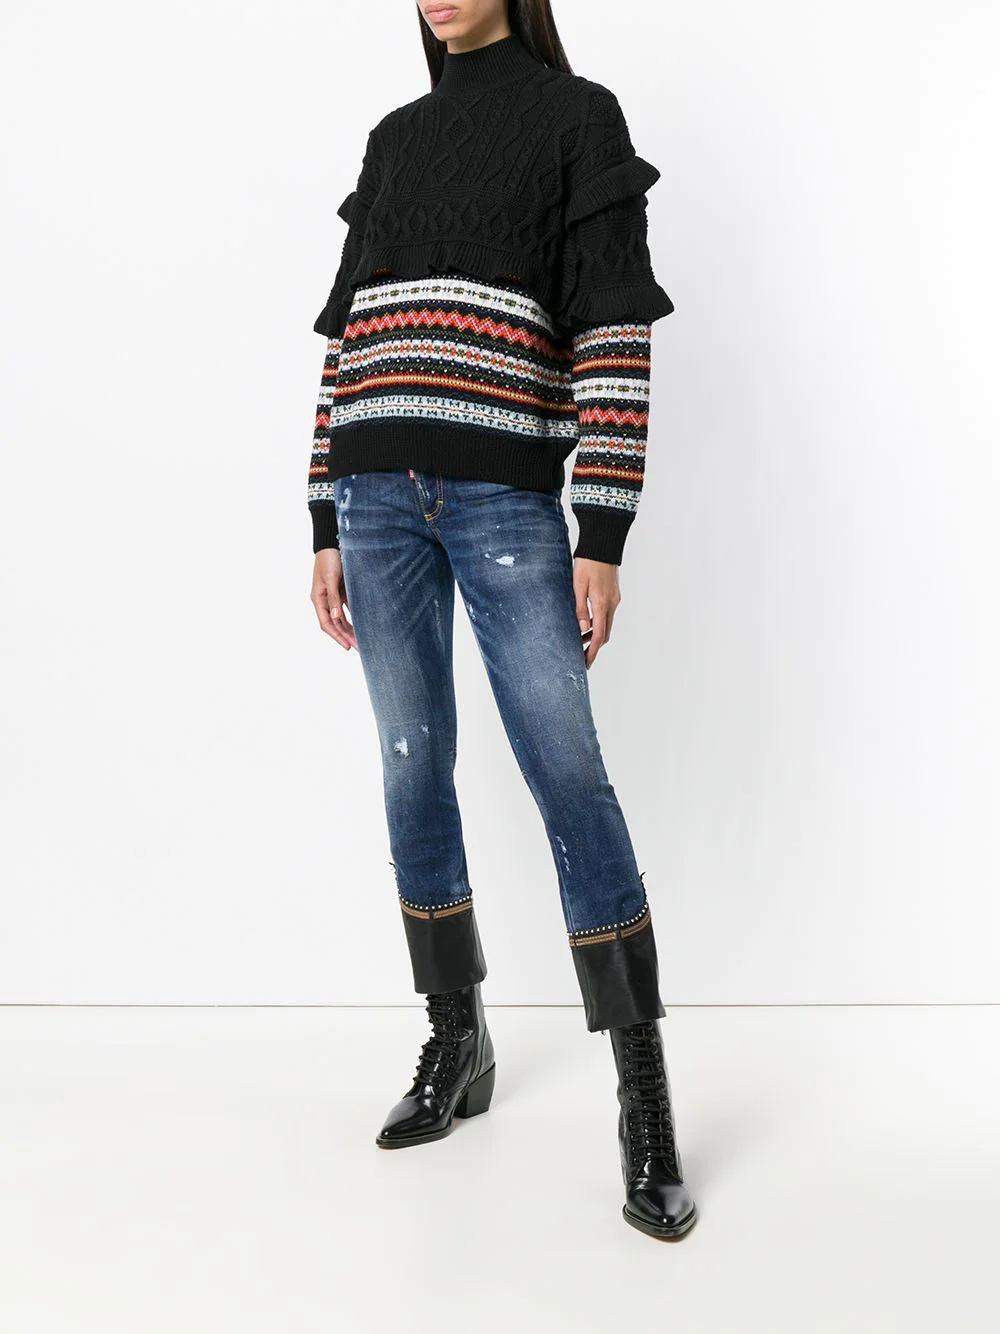 DSQUARED2 | Dsquared2 укороченные джинсы клеш 'Runway' | Clouty